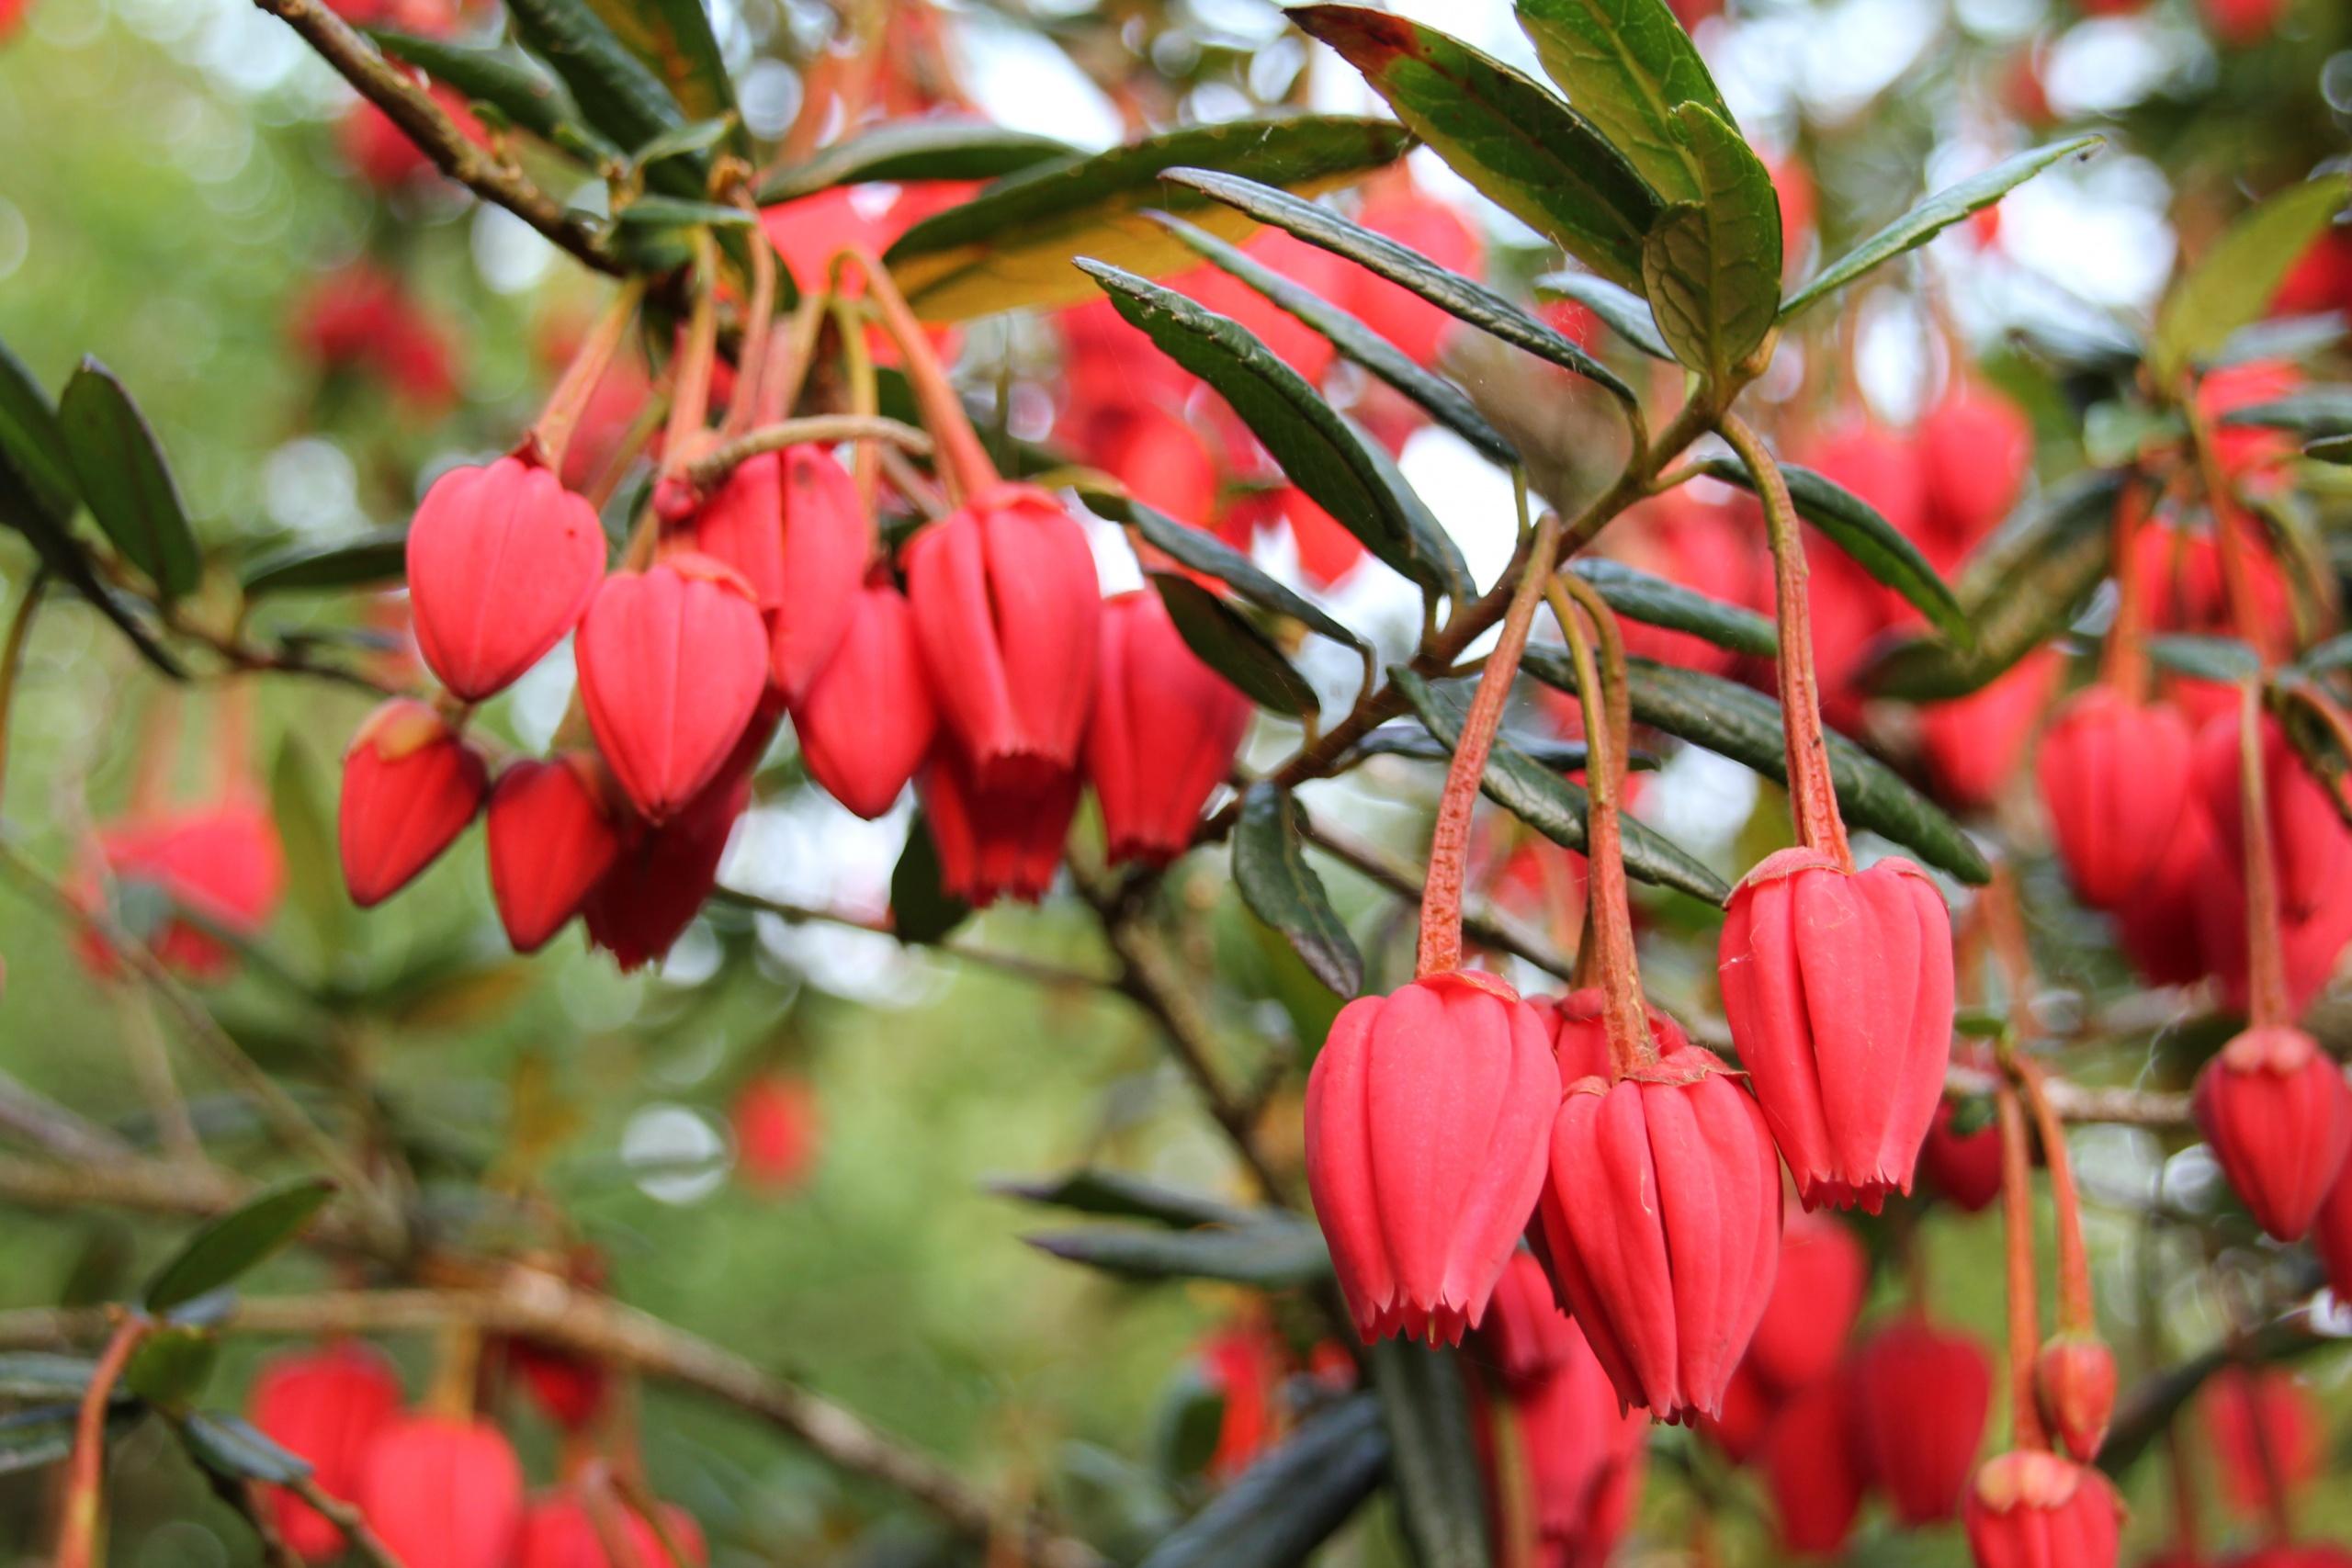 Crinodendron